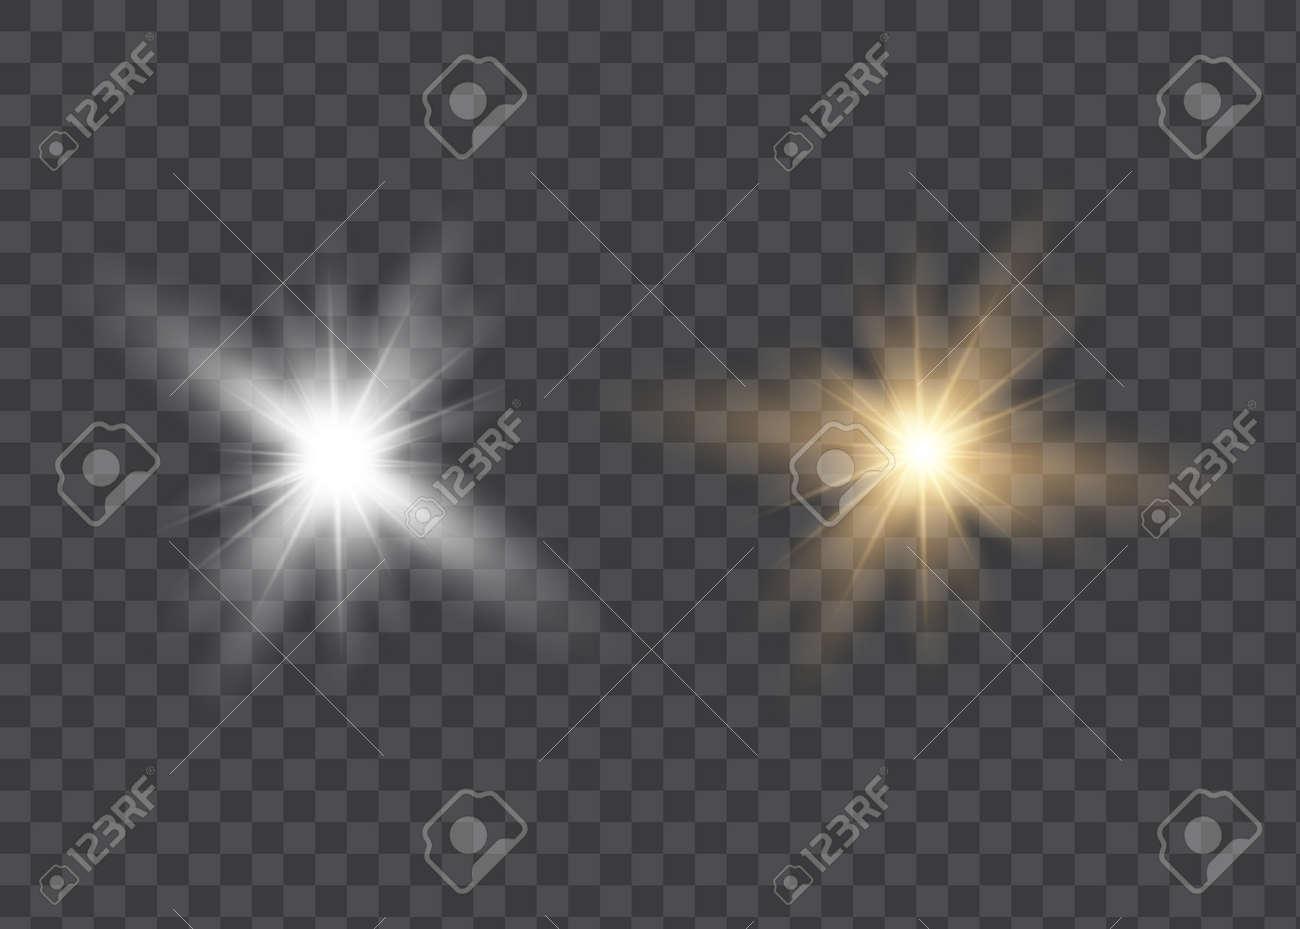 Vector transparent sunlight special lens flare light effect - 169711997